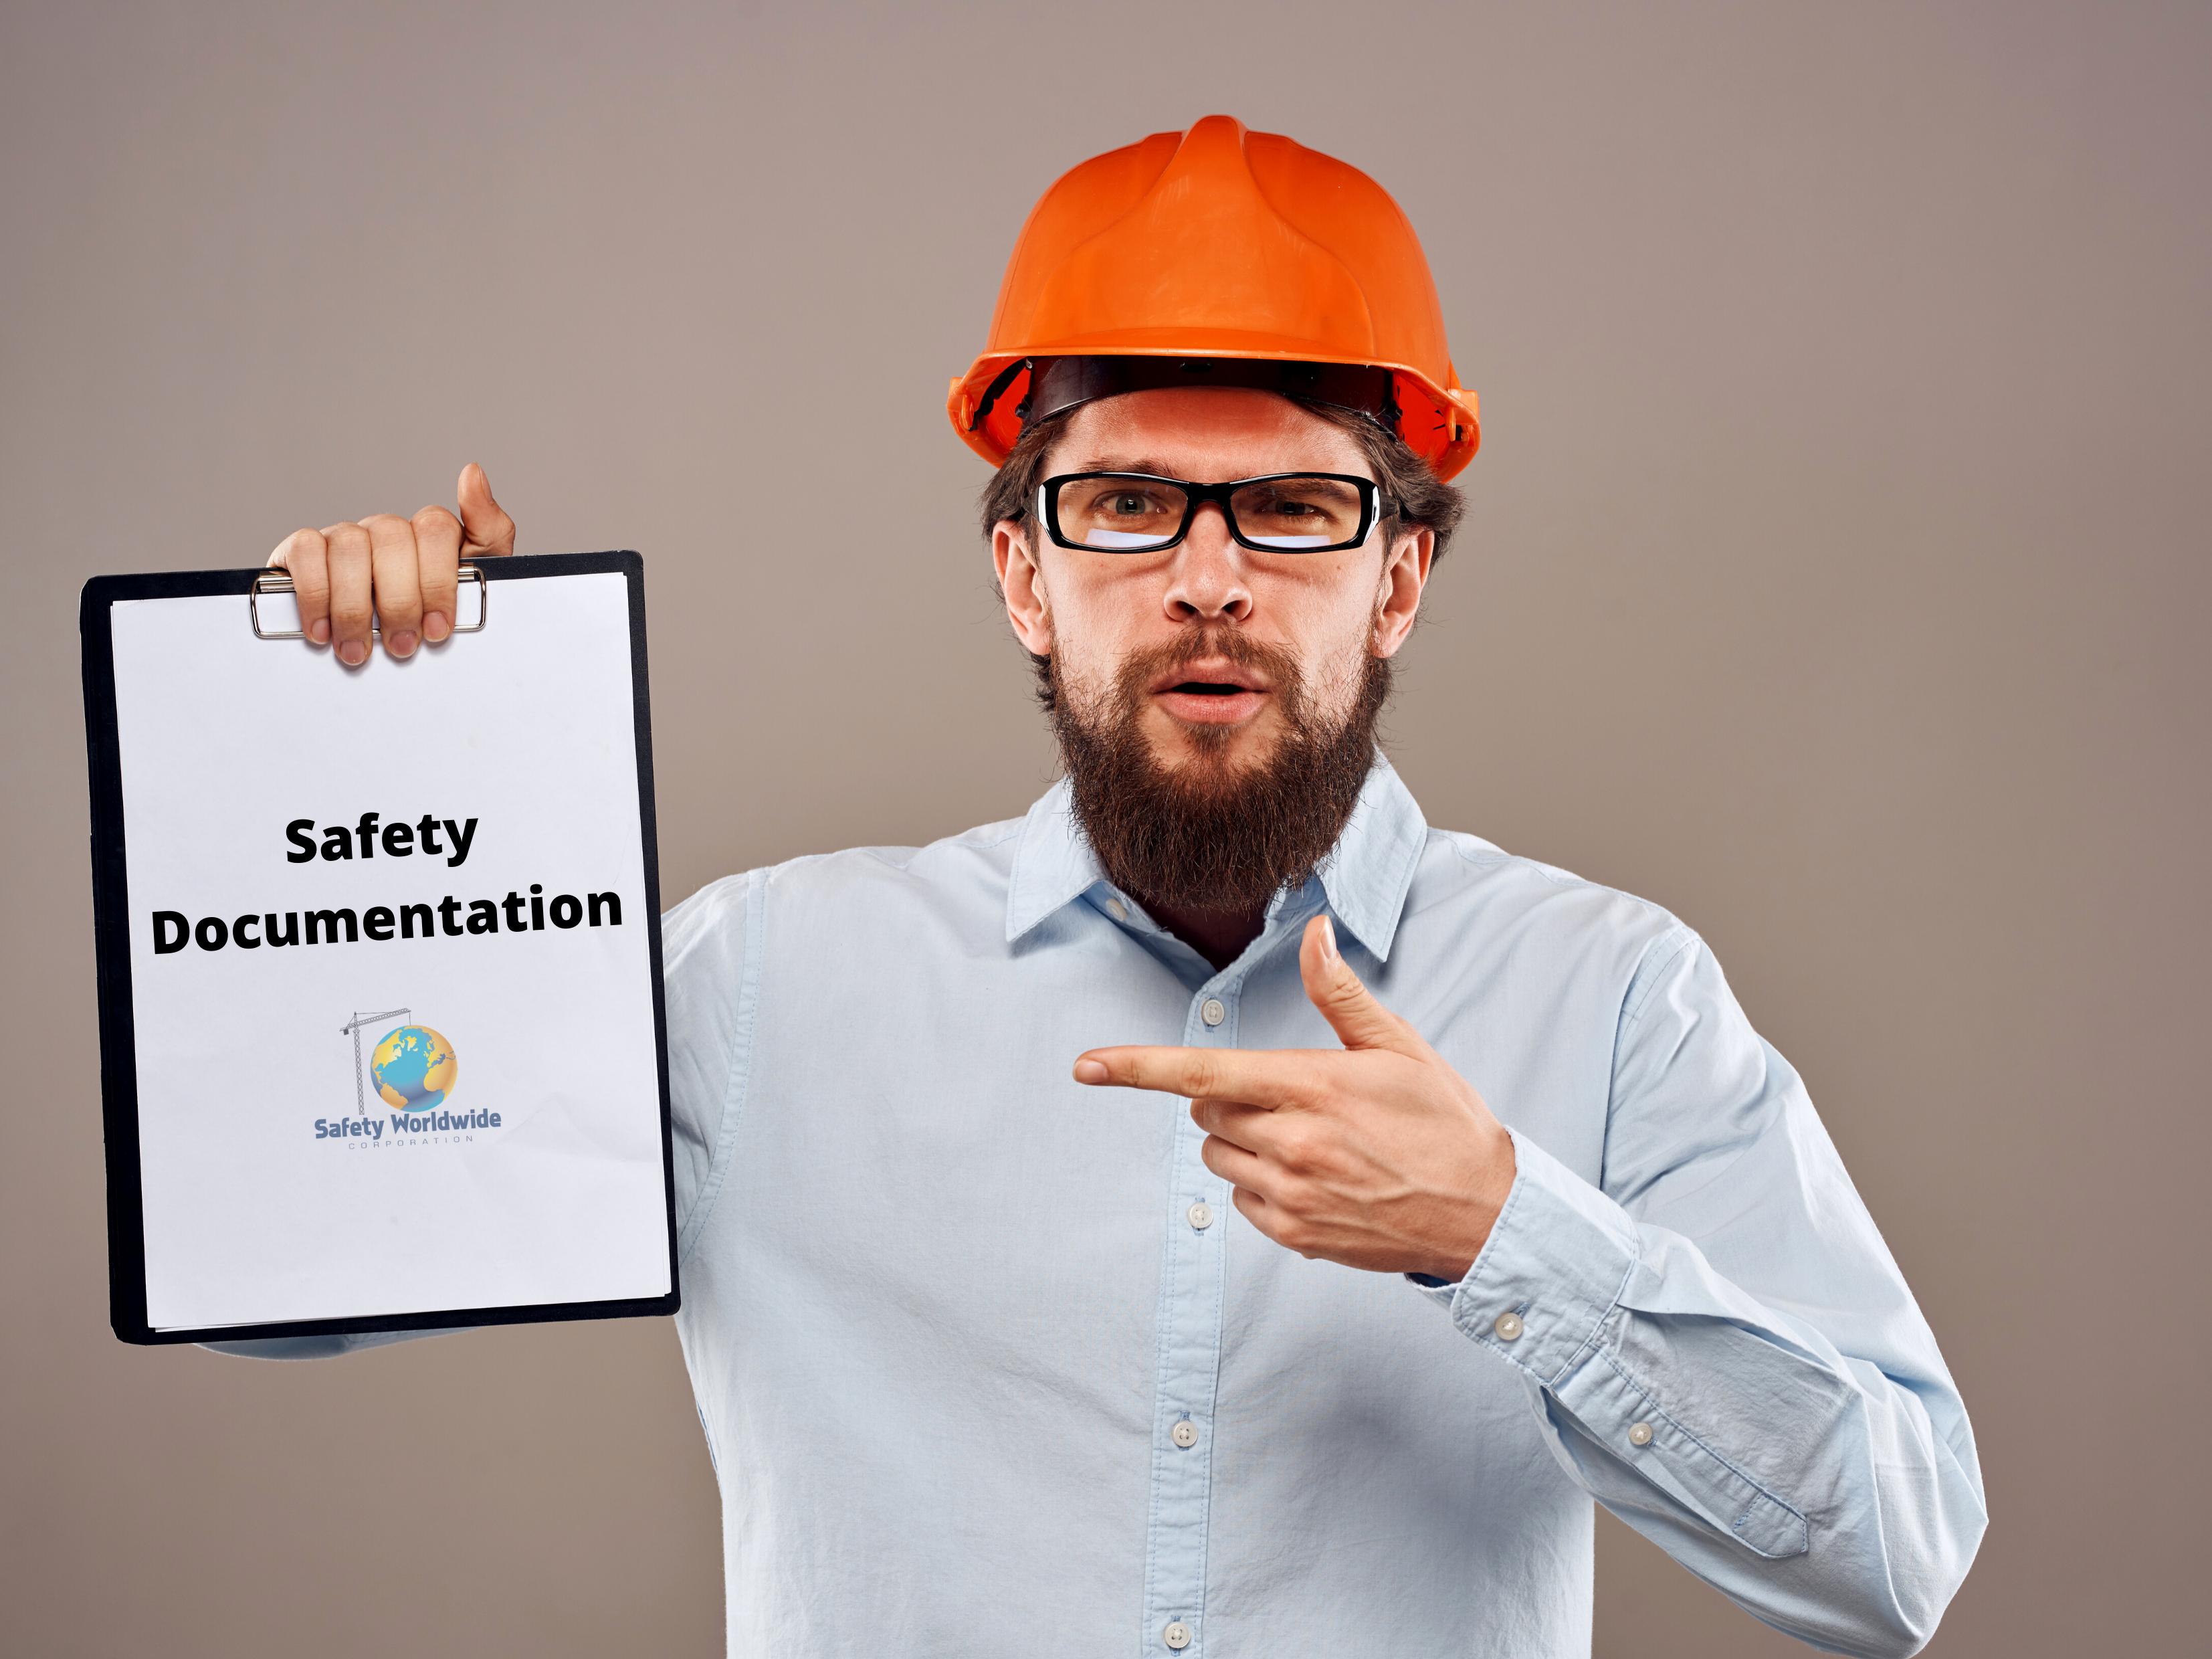 Safety Documentation